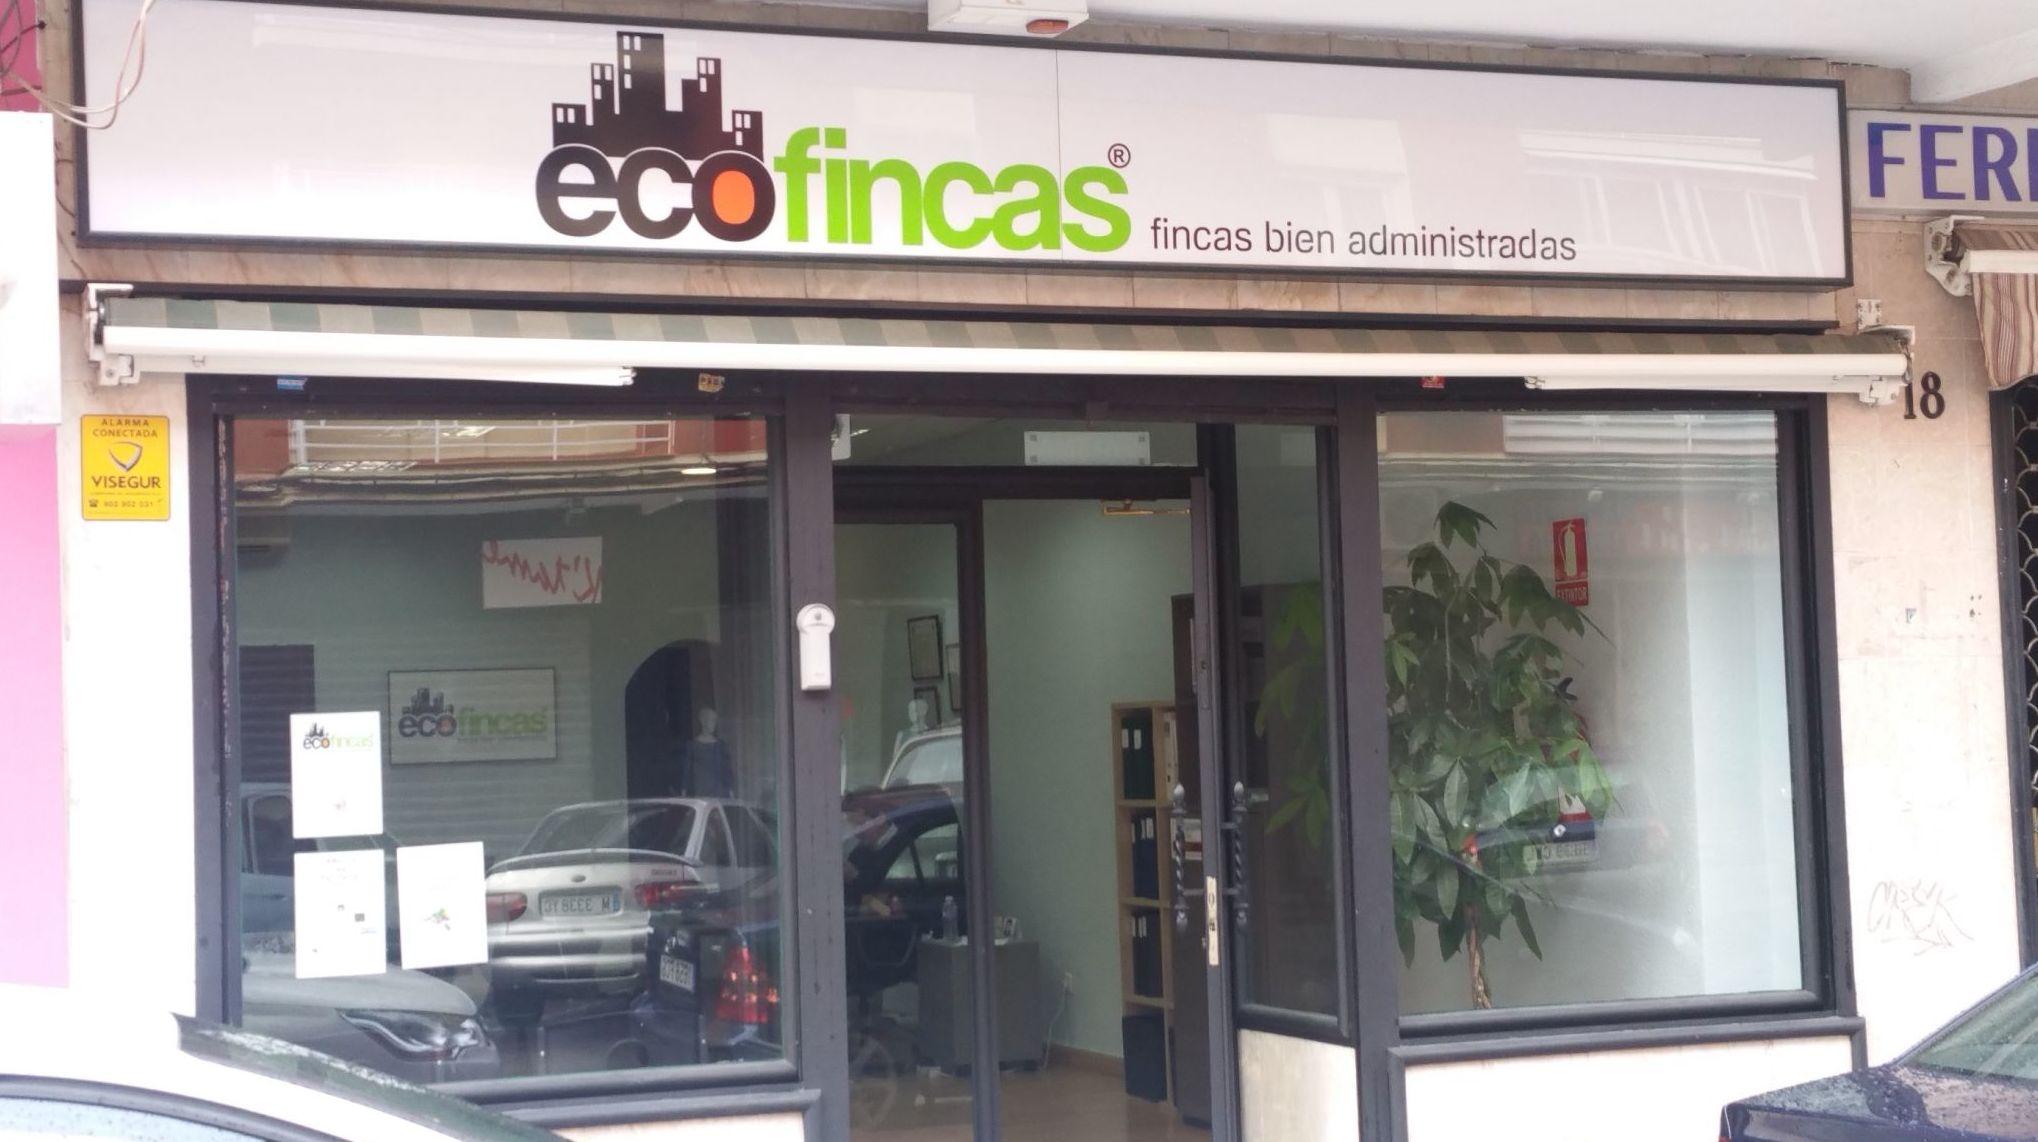 Fachada de Ecofincas en Parla